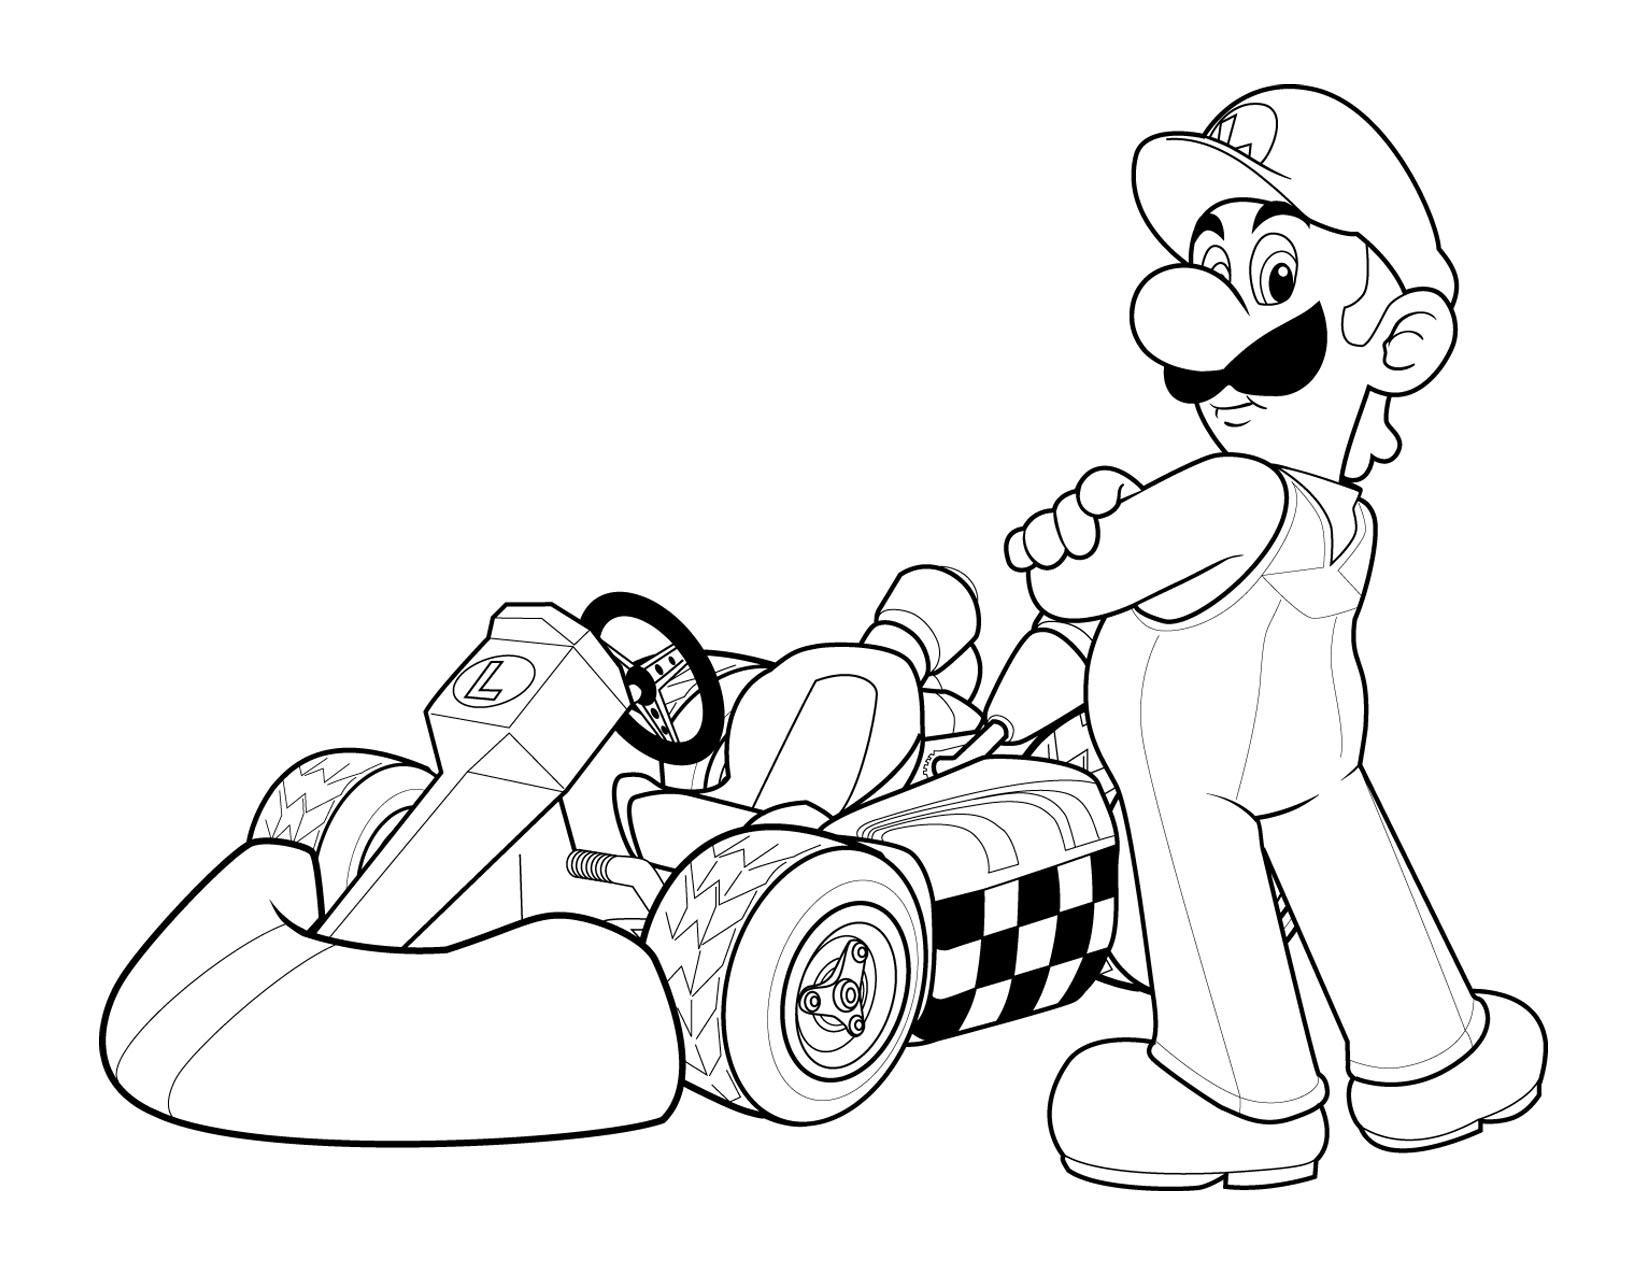 Coloriage Mario Bros #112478 (Jeux Vidéos) - Album de ...